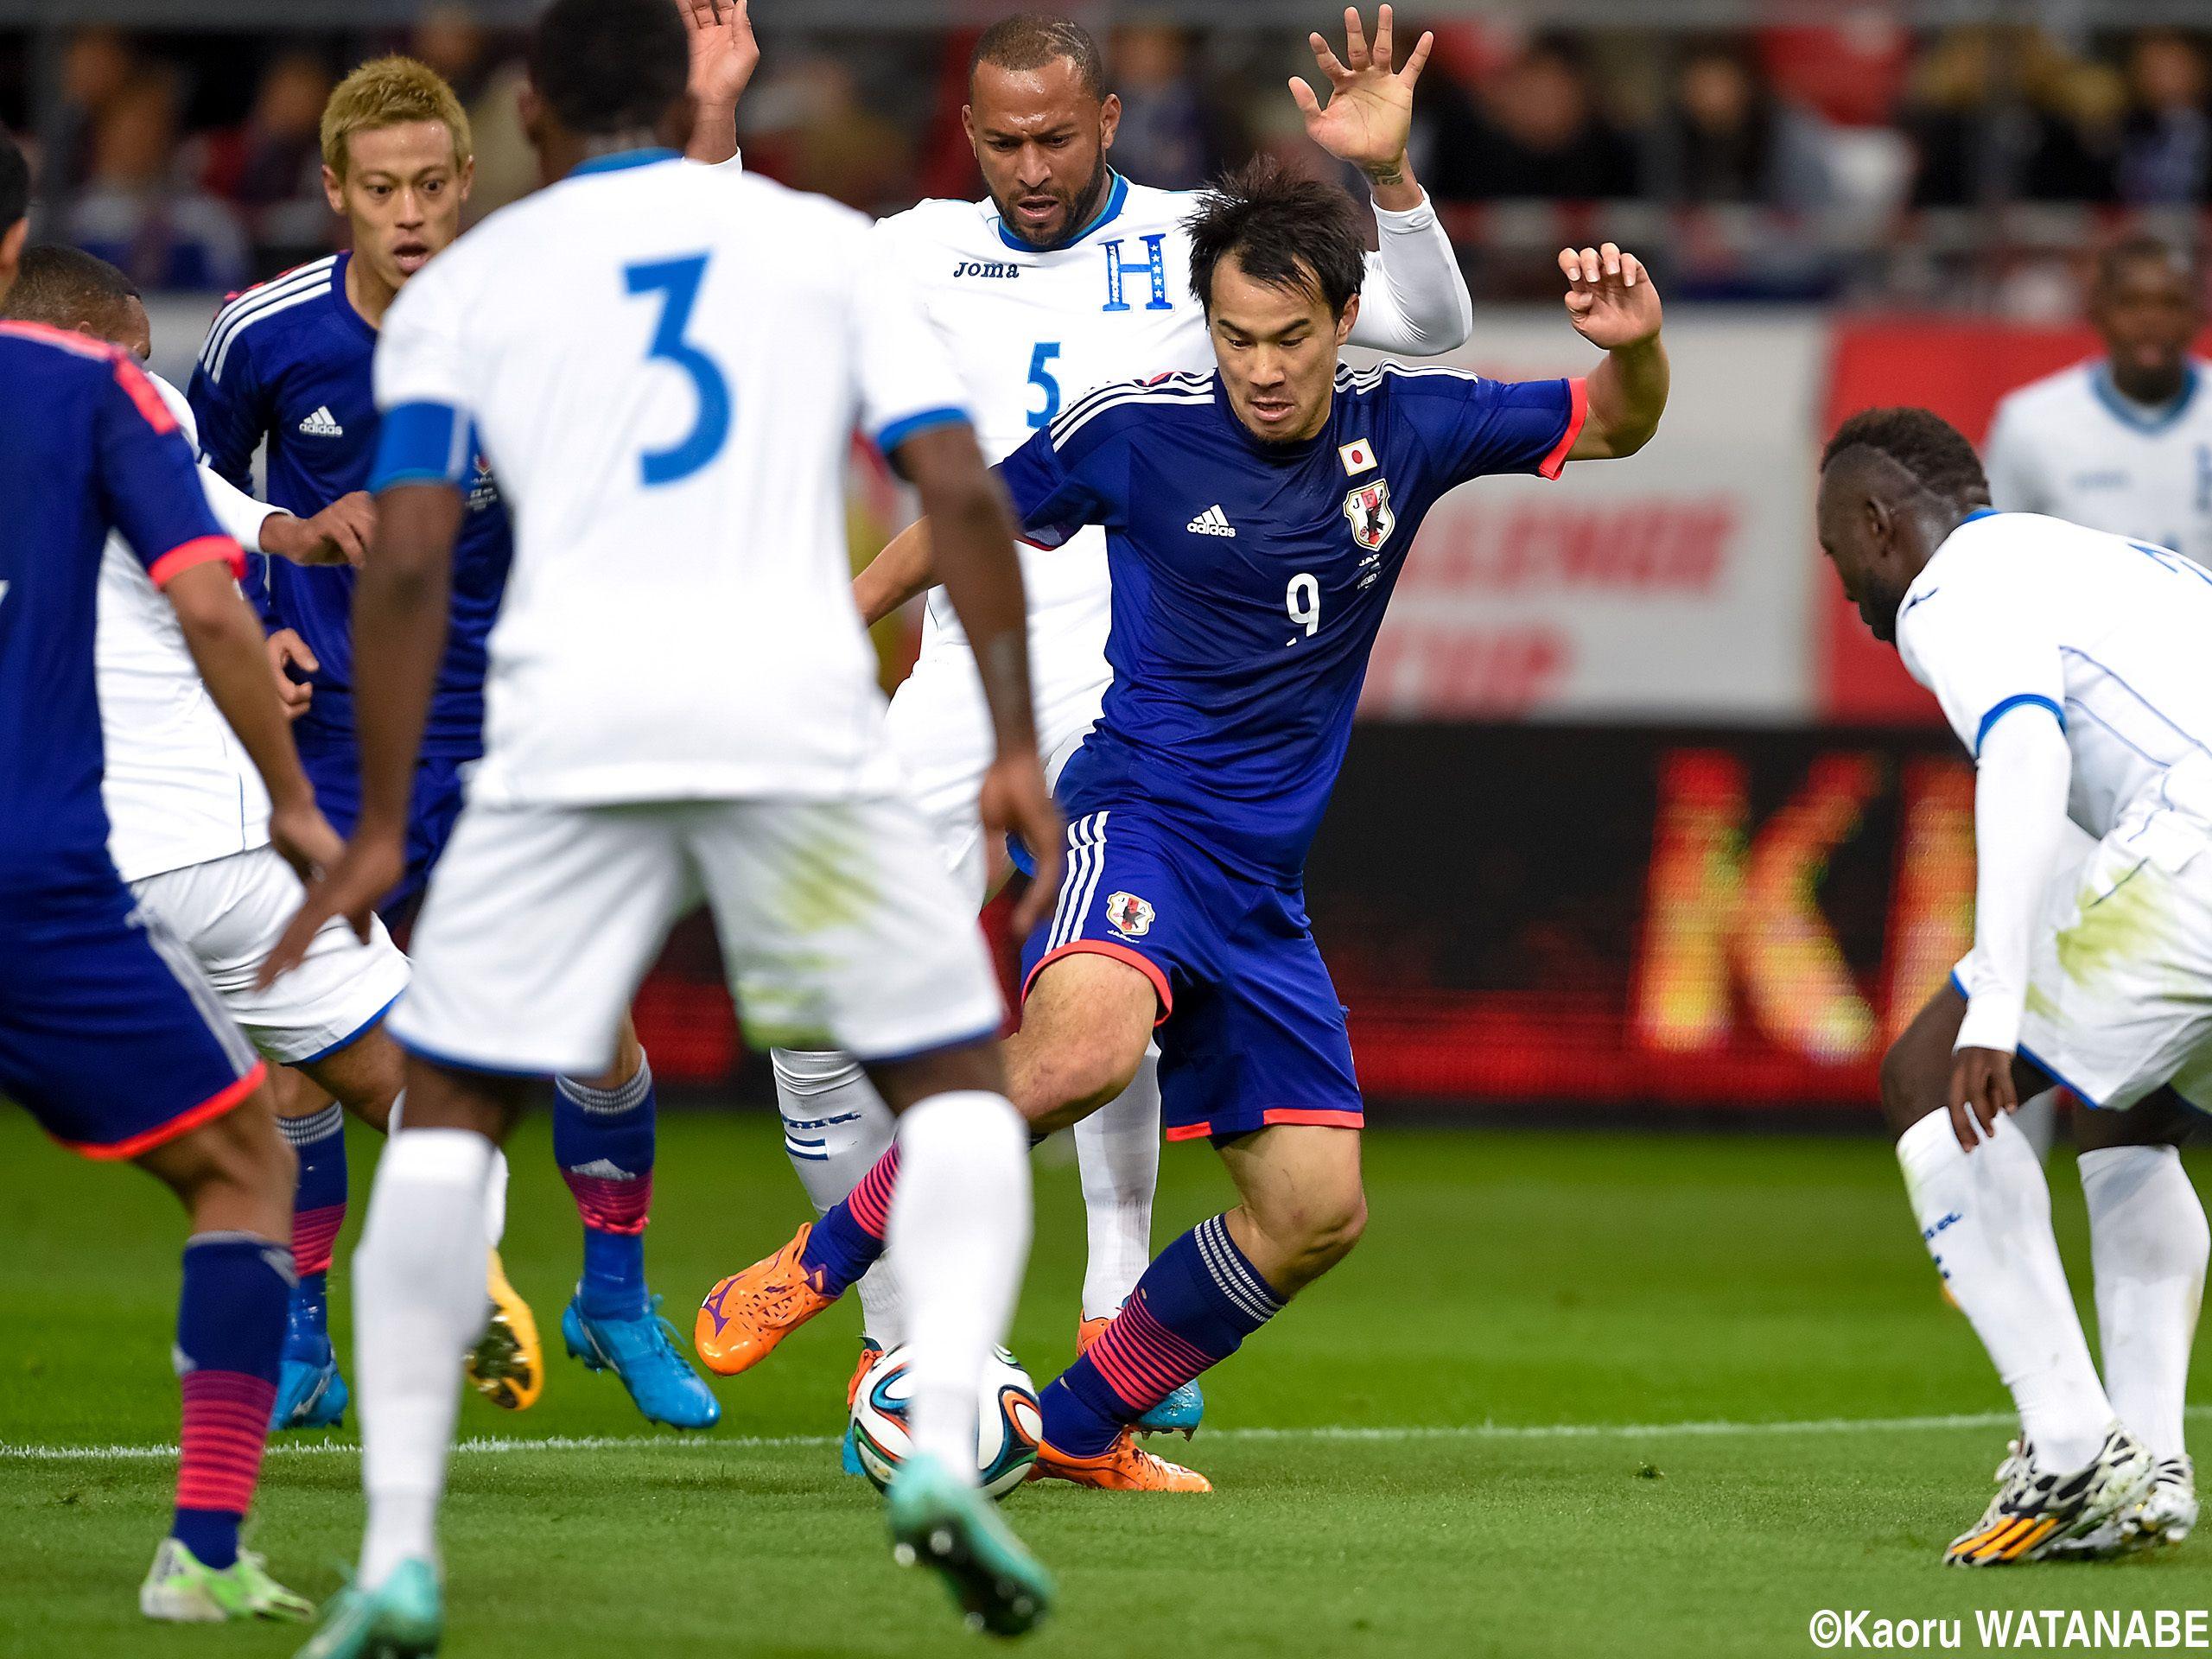 Shinji Okazaki - FW - #9 KIRIN CHALLENGE CUP Japan vs. Honduras #Soccer